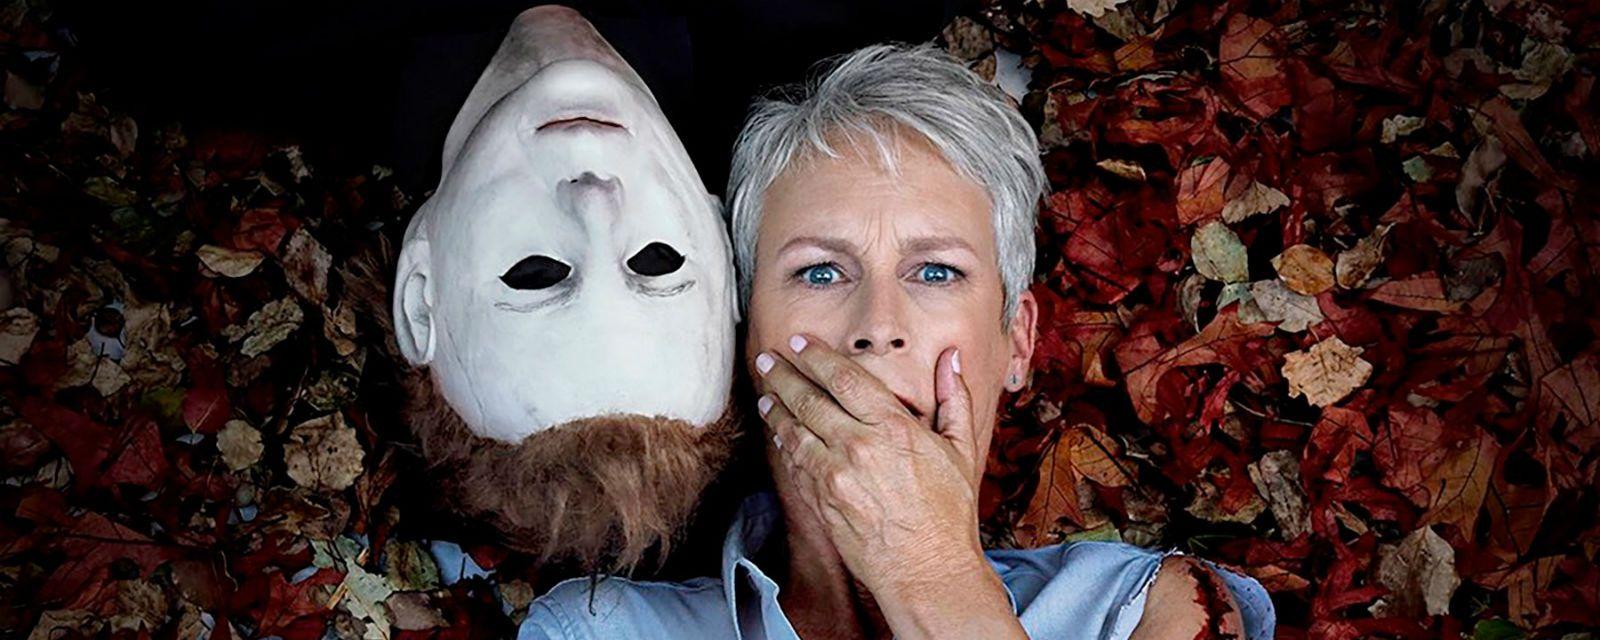 Halloween (2018) Andi Matichak, Christopher Allen Nelson